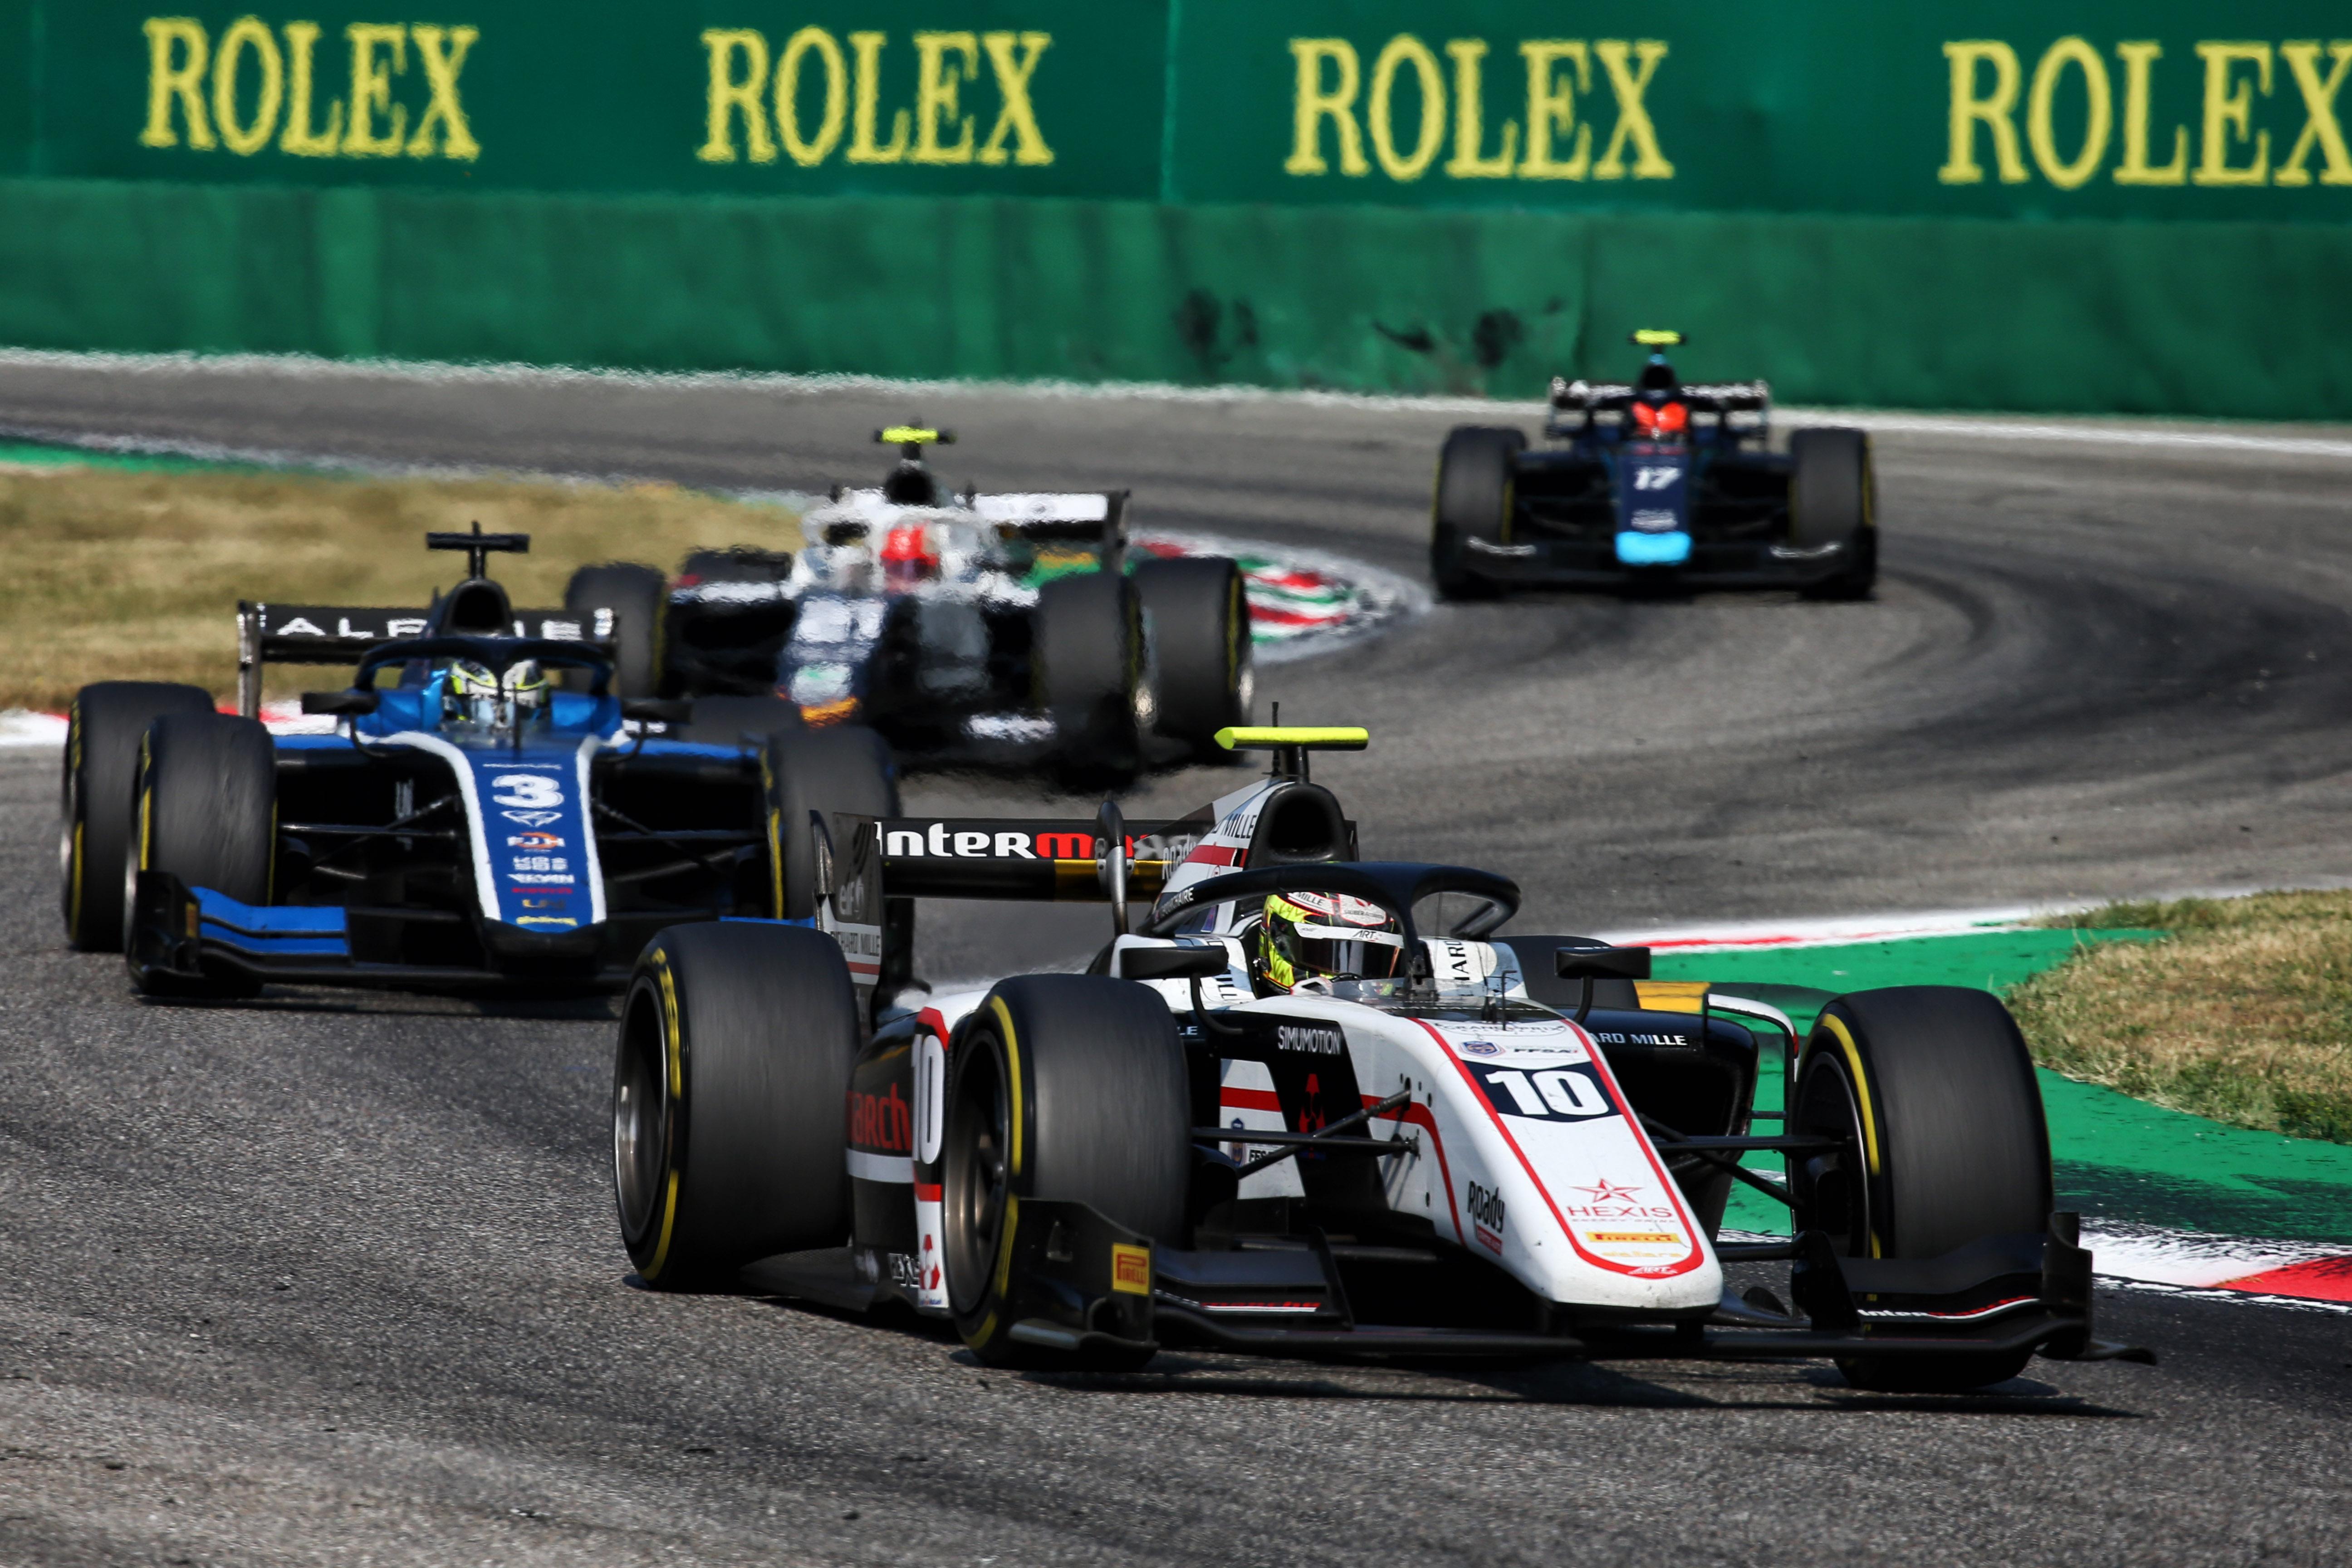 Motor Racing Fia Formula 2 Championship Saturday Monza, Italy